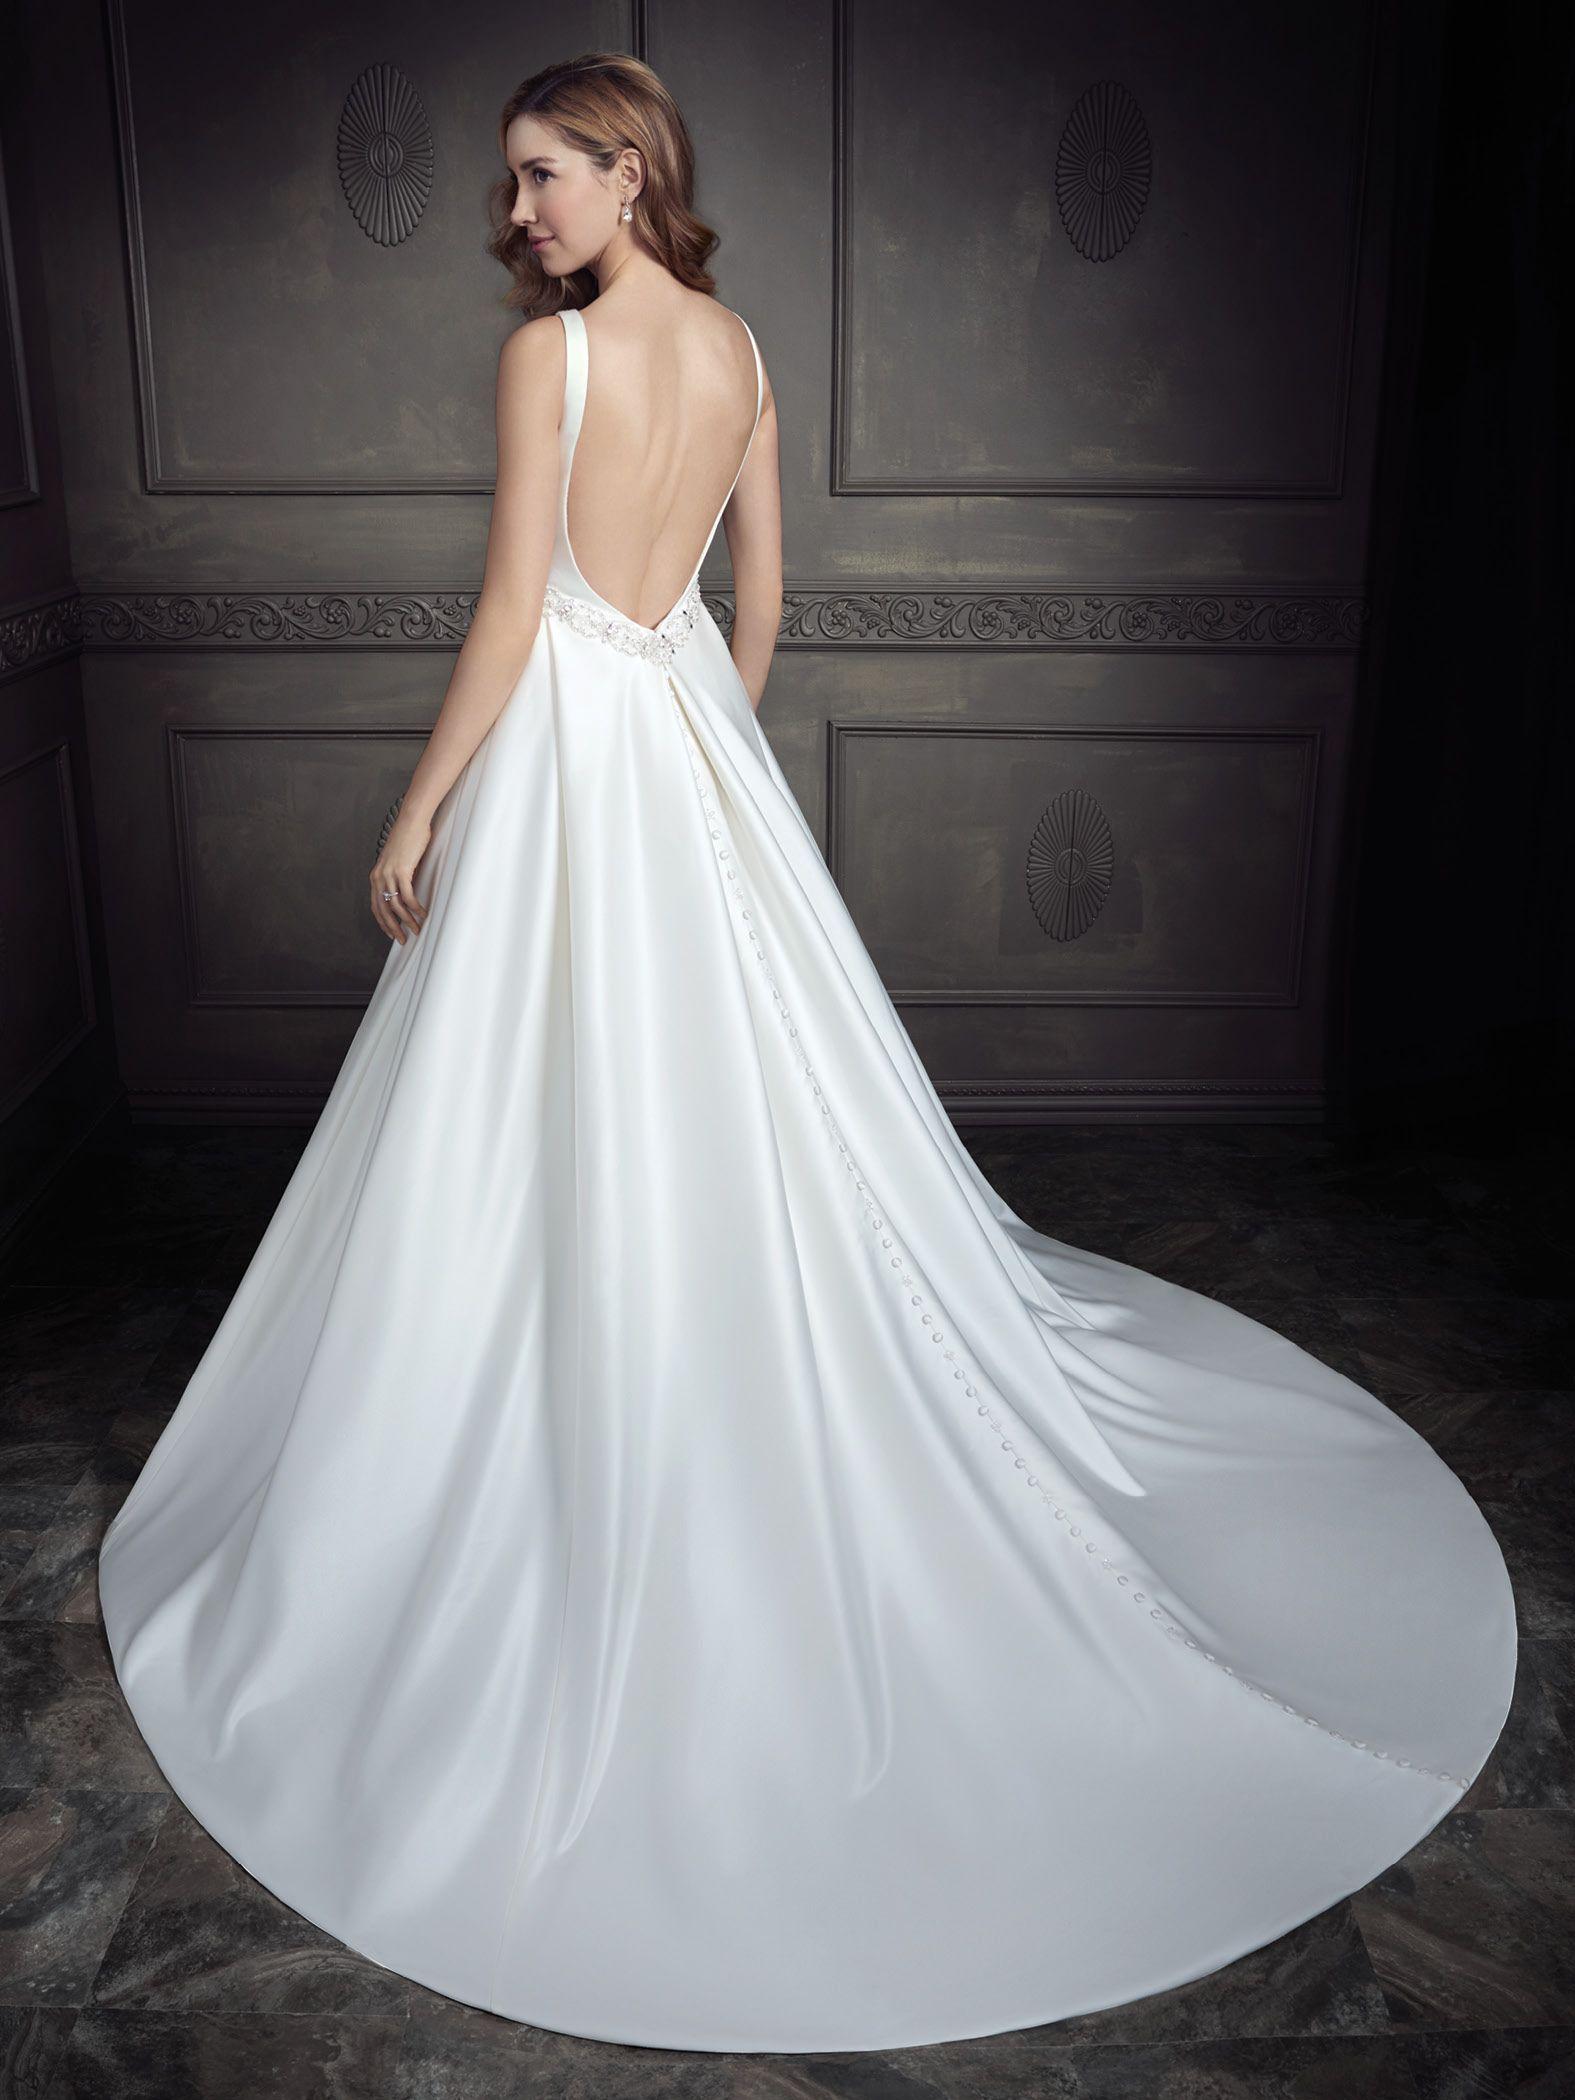 Elite wedding dresses  Ella Rosa Style BE weddingdress bridal  Weddings  Pinterest